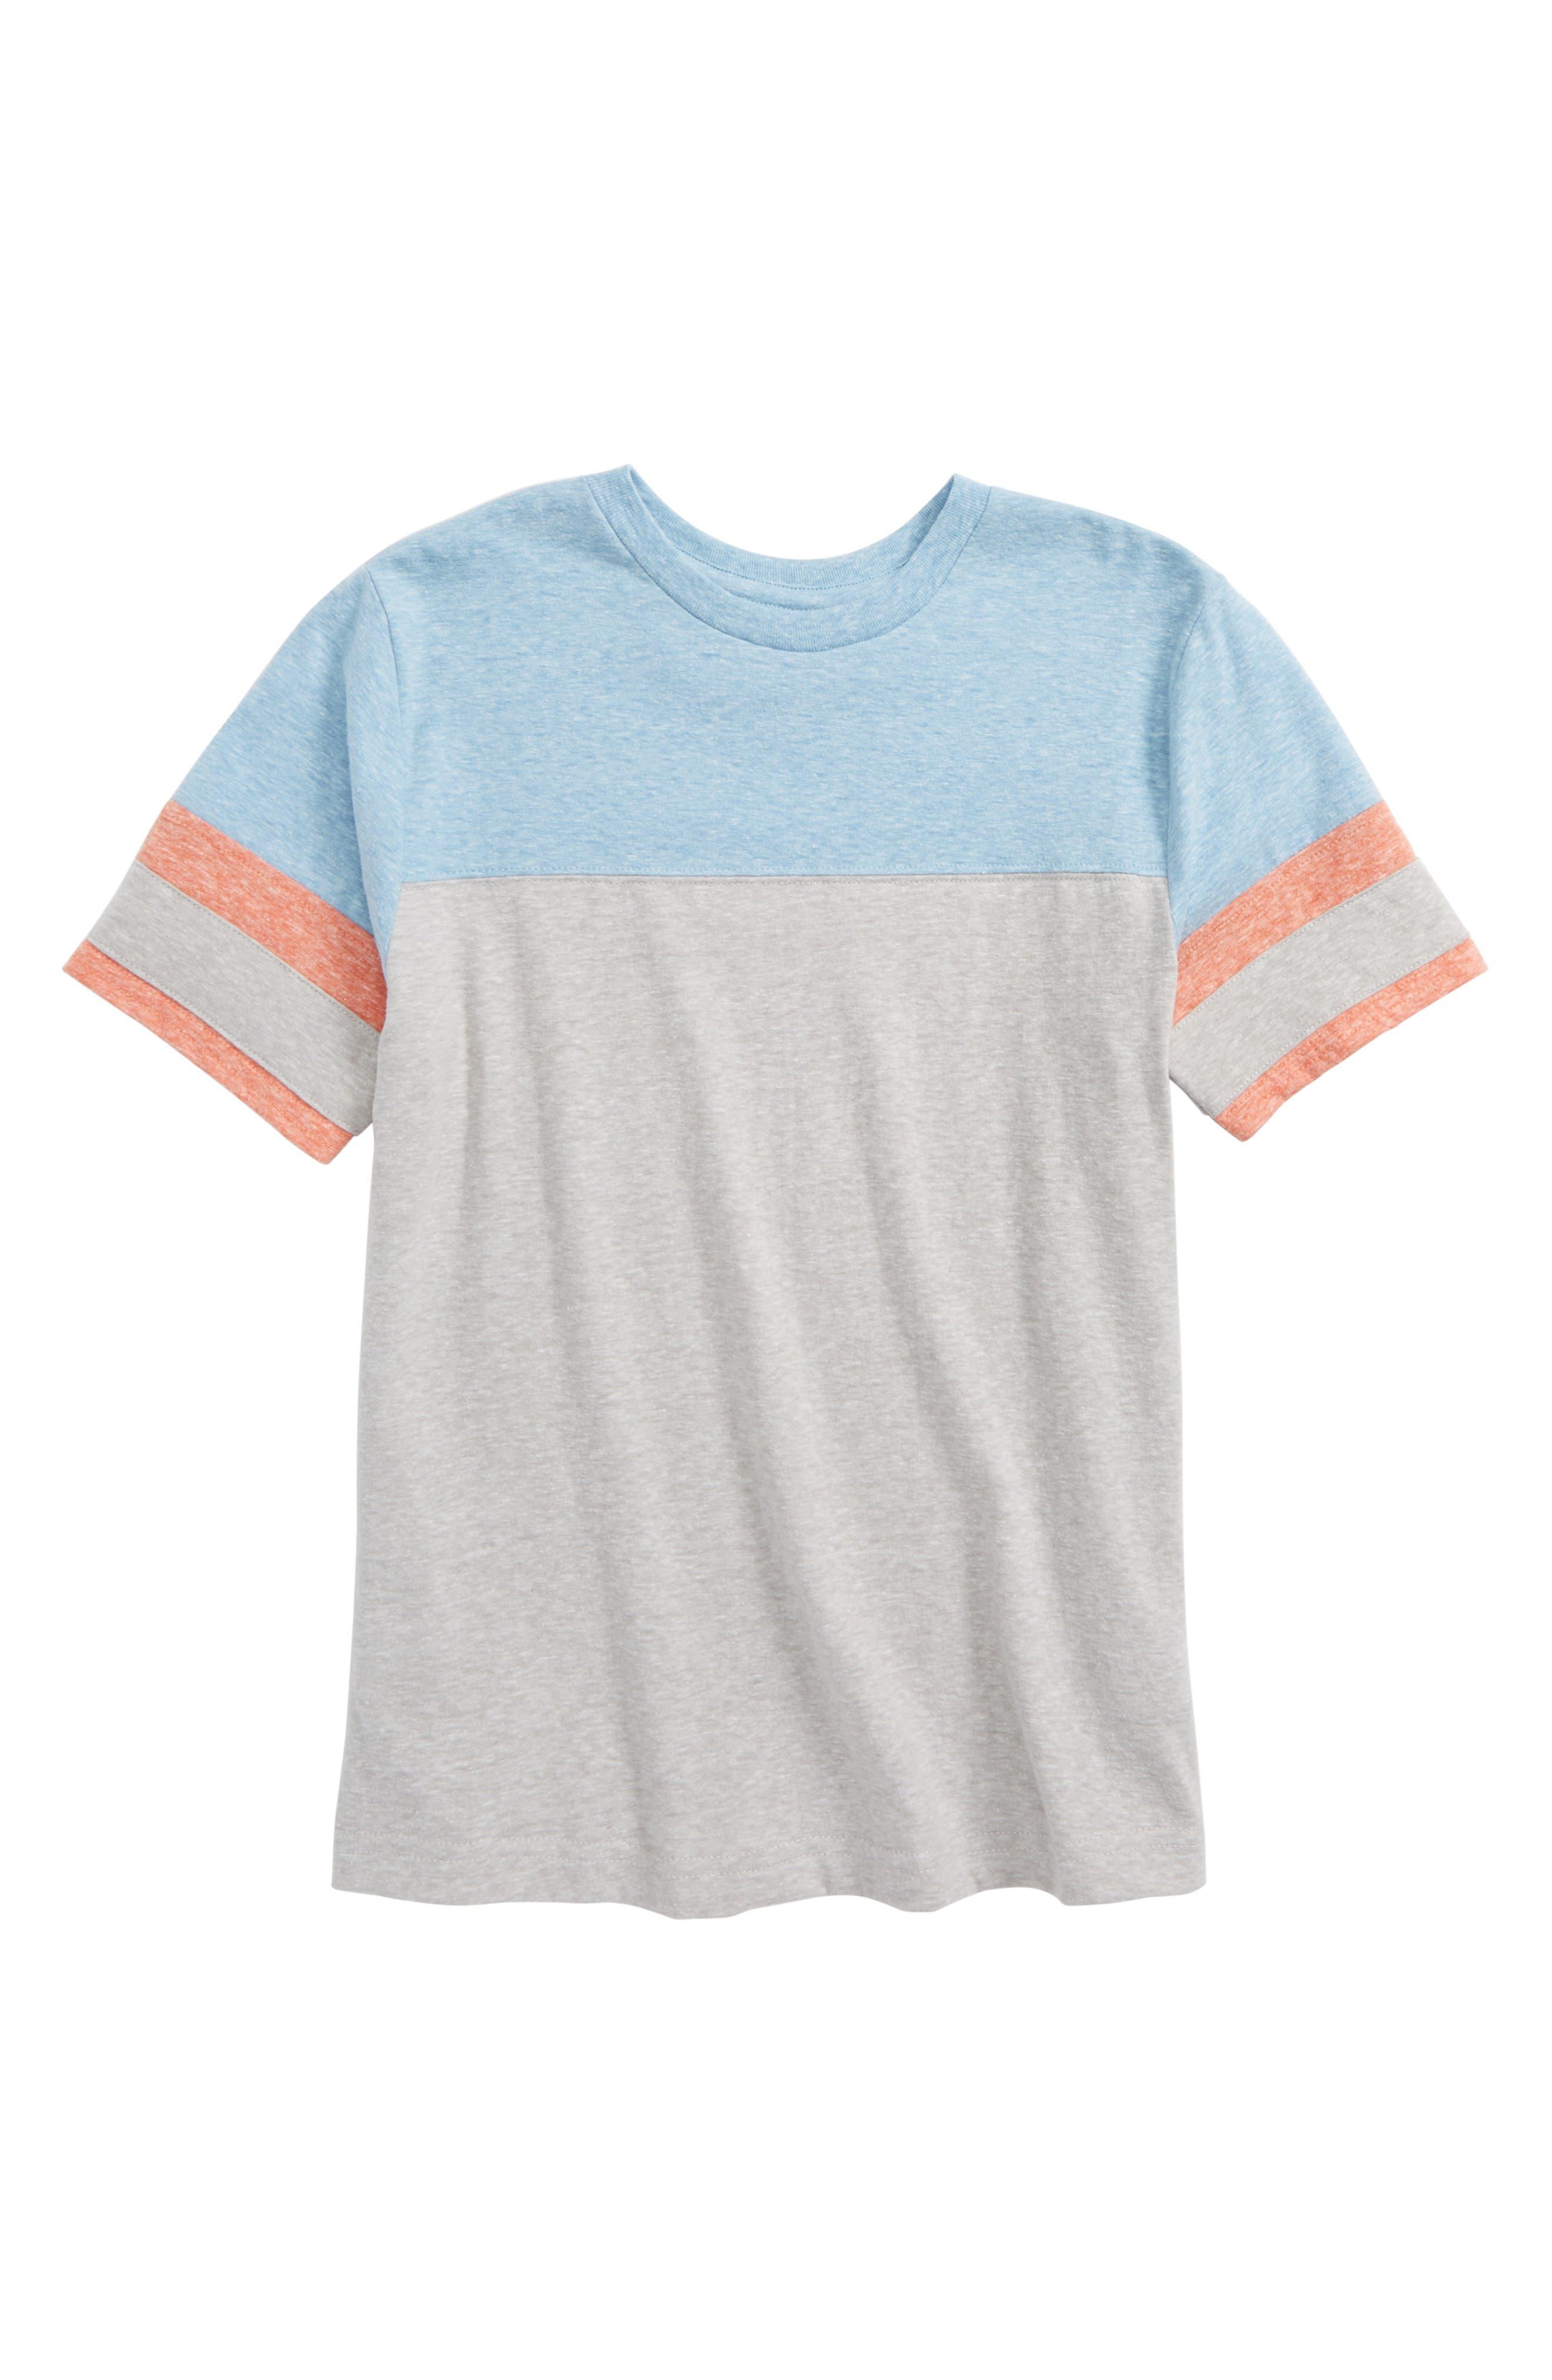 Tucker + Tate Colorblock T-Shirt (Big Boys)